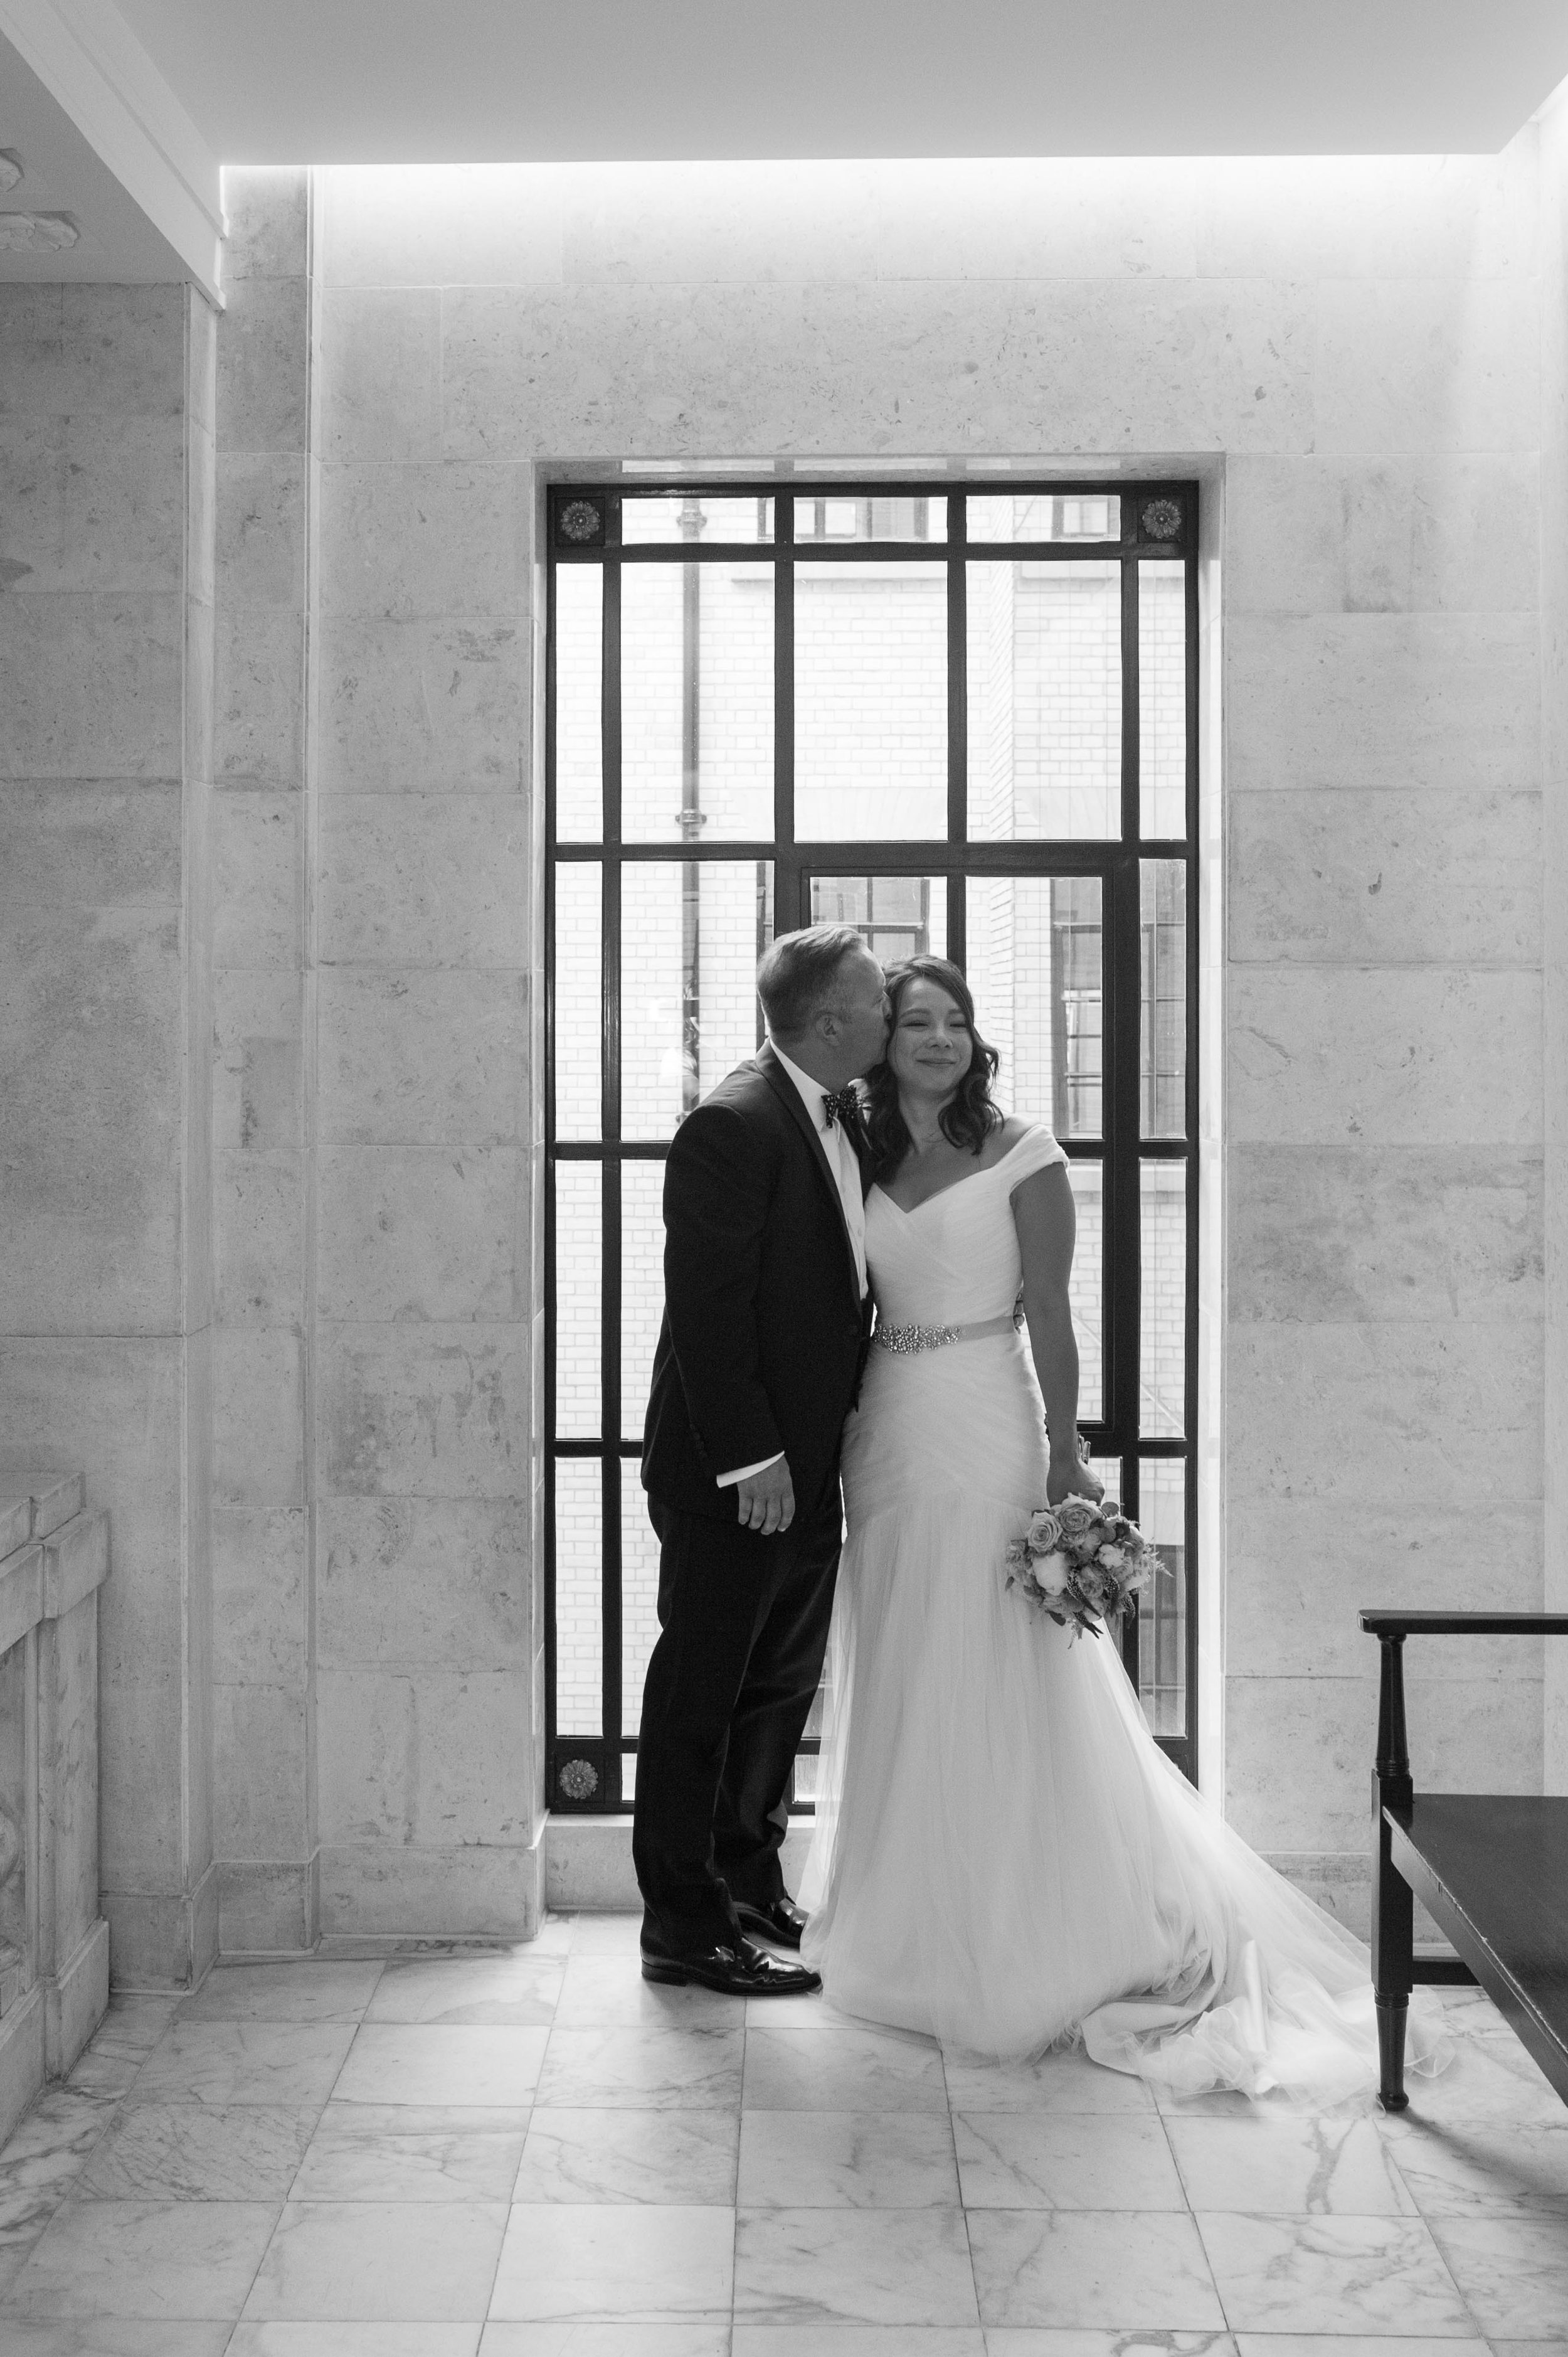 D&M_Marylebone Town Hall Wedding (120 of 239).jpg